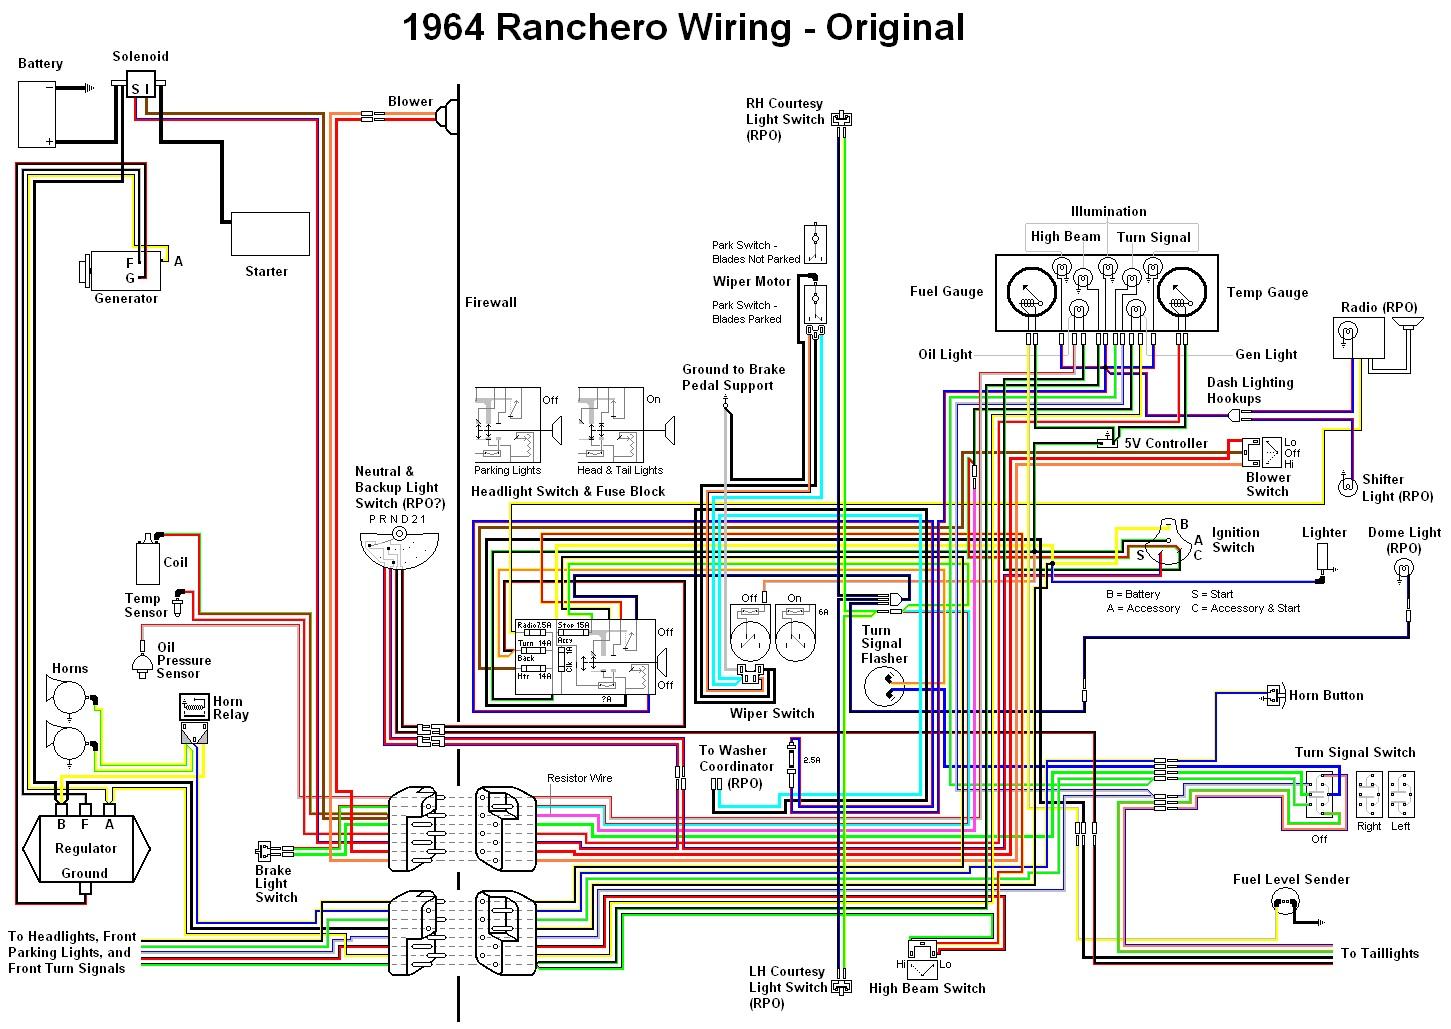 1962 ford falcon wiring diagram 1964 falcon wiring diagram wiring diagram data  1964 falcon wiring diagram wiring